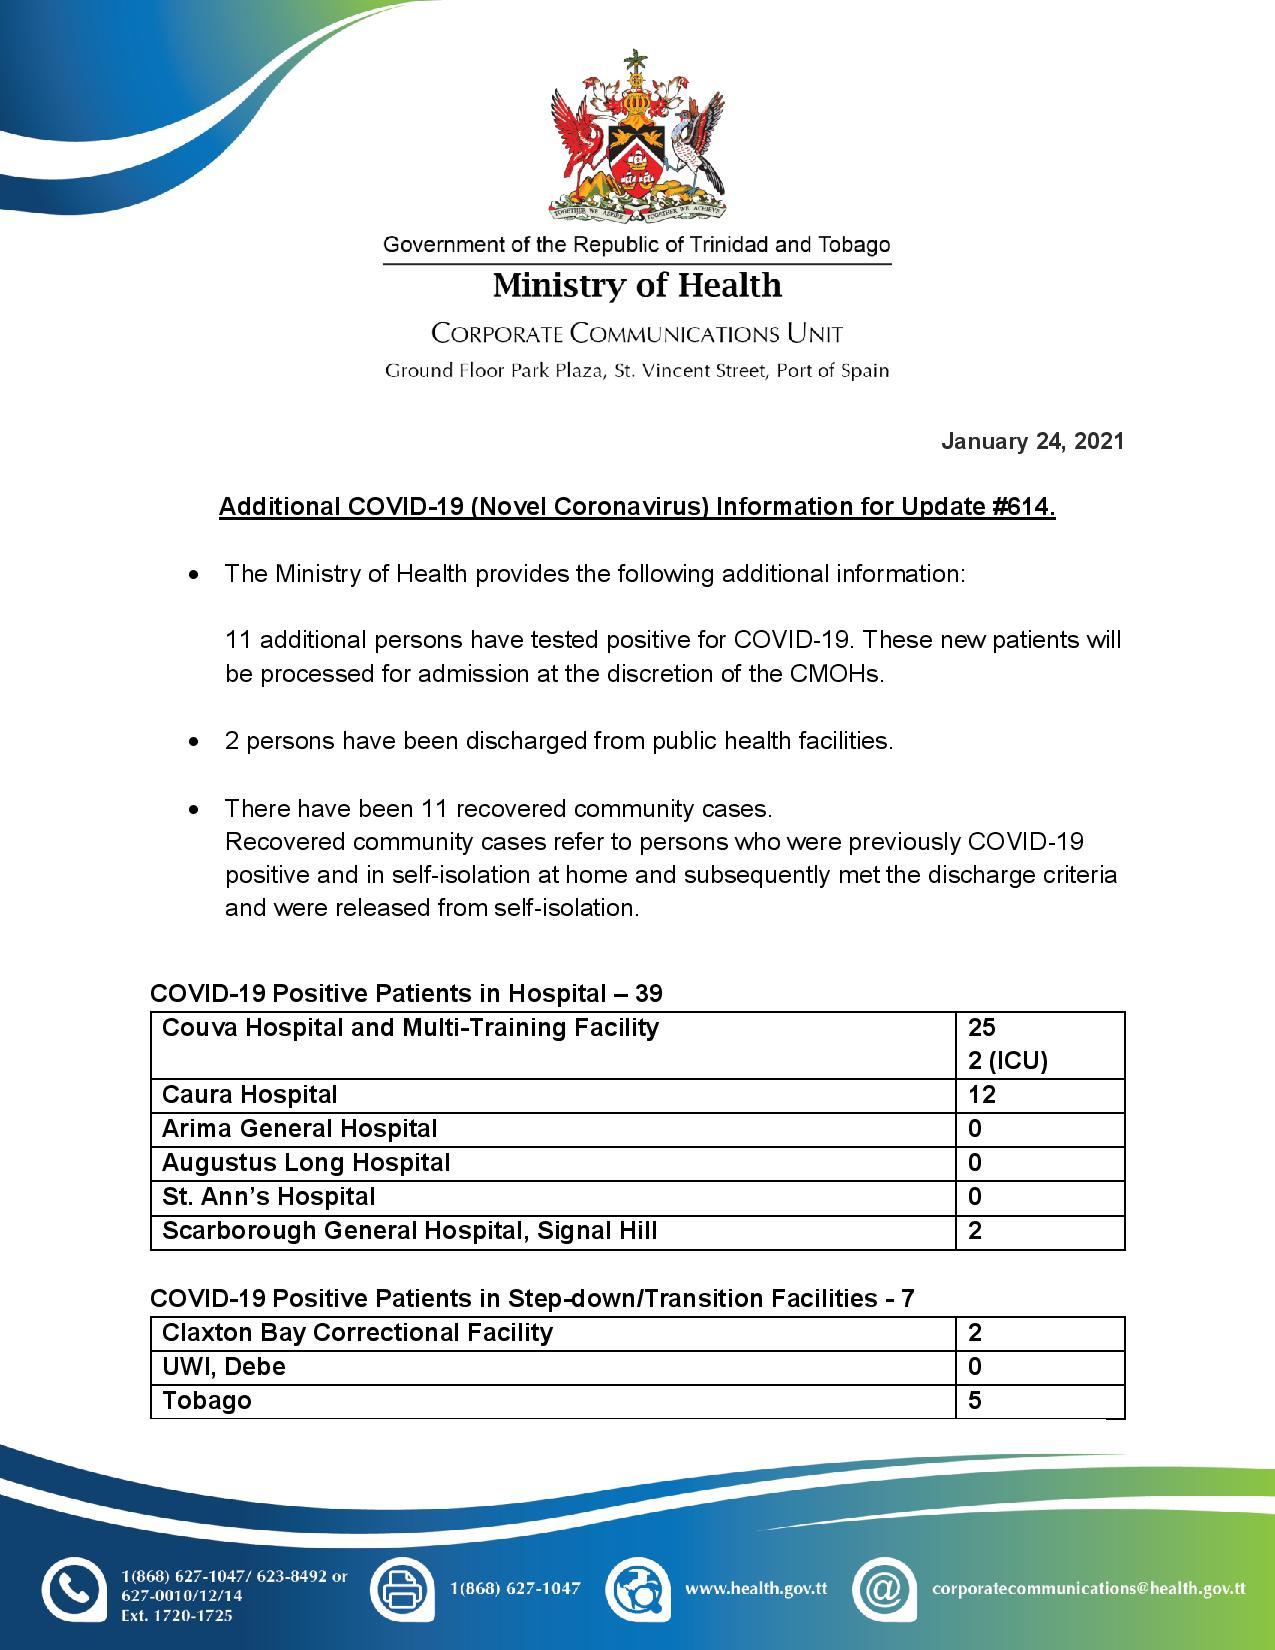 COVID-19 UPDATE - Sunday 24th January 2021 Additional